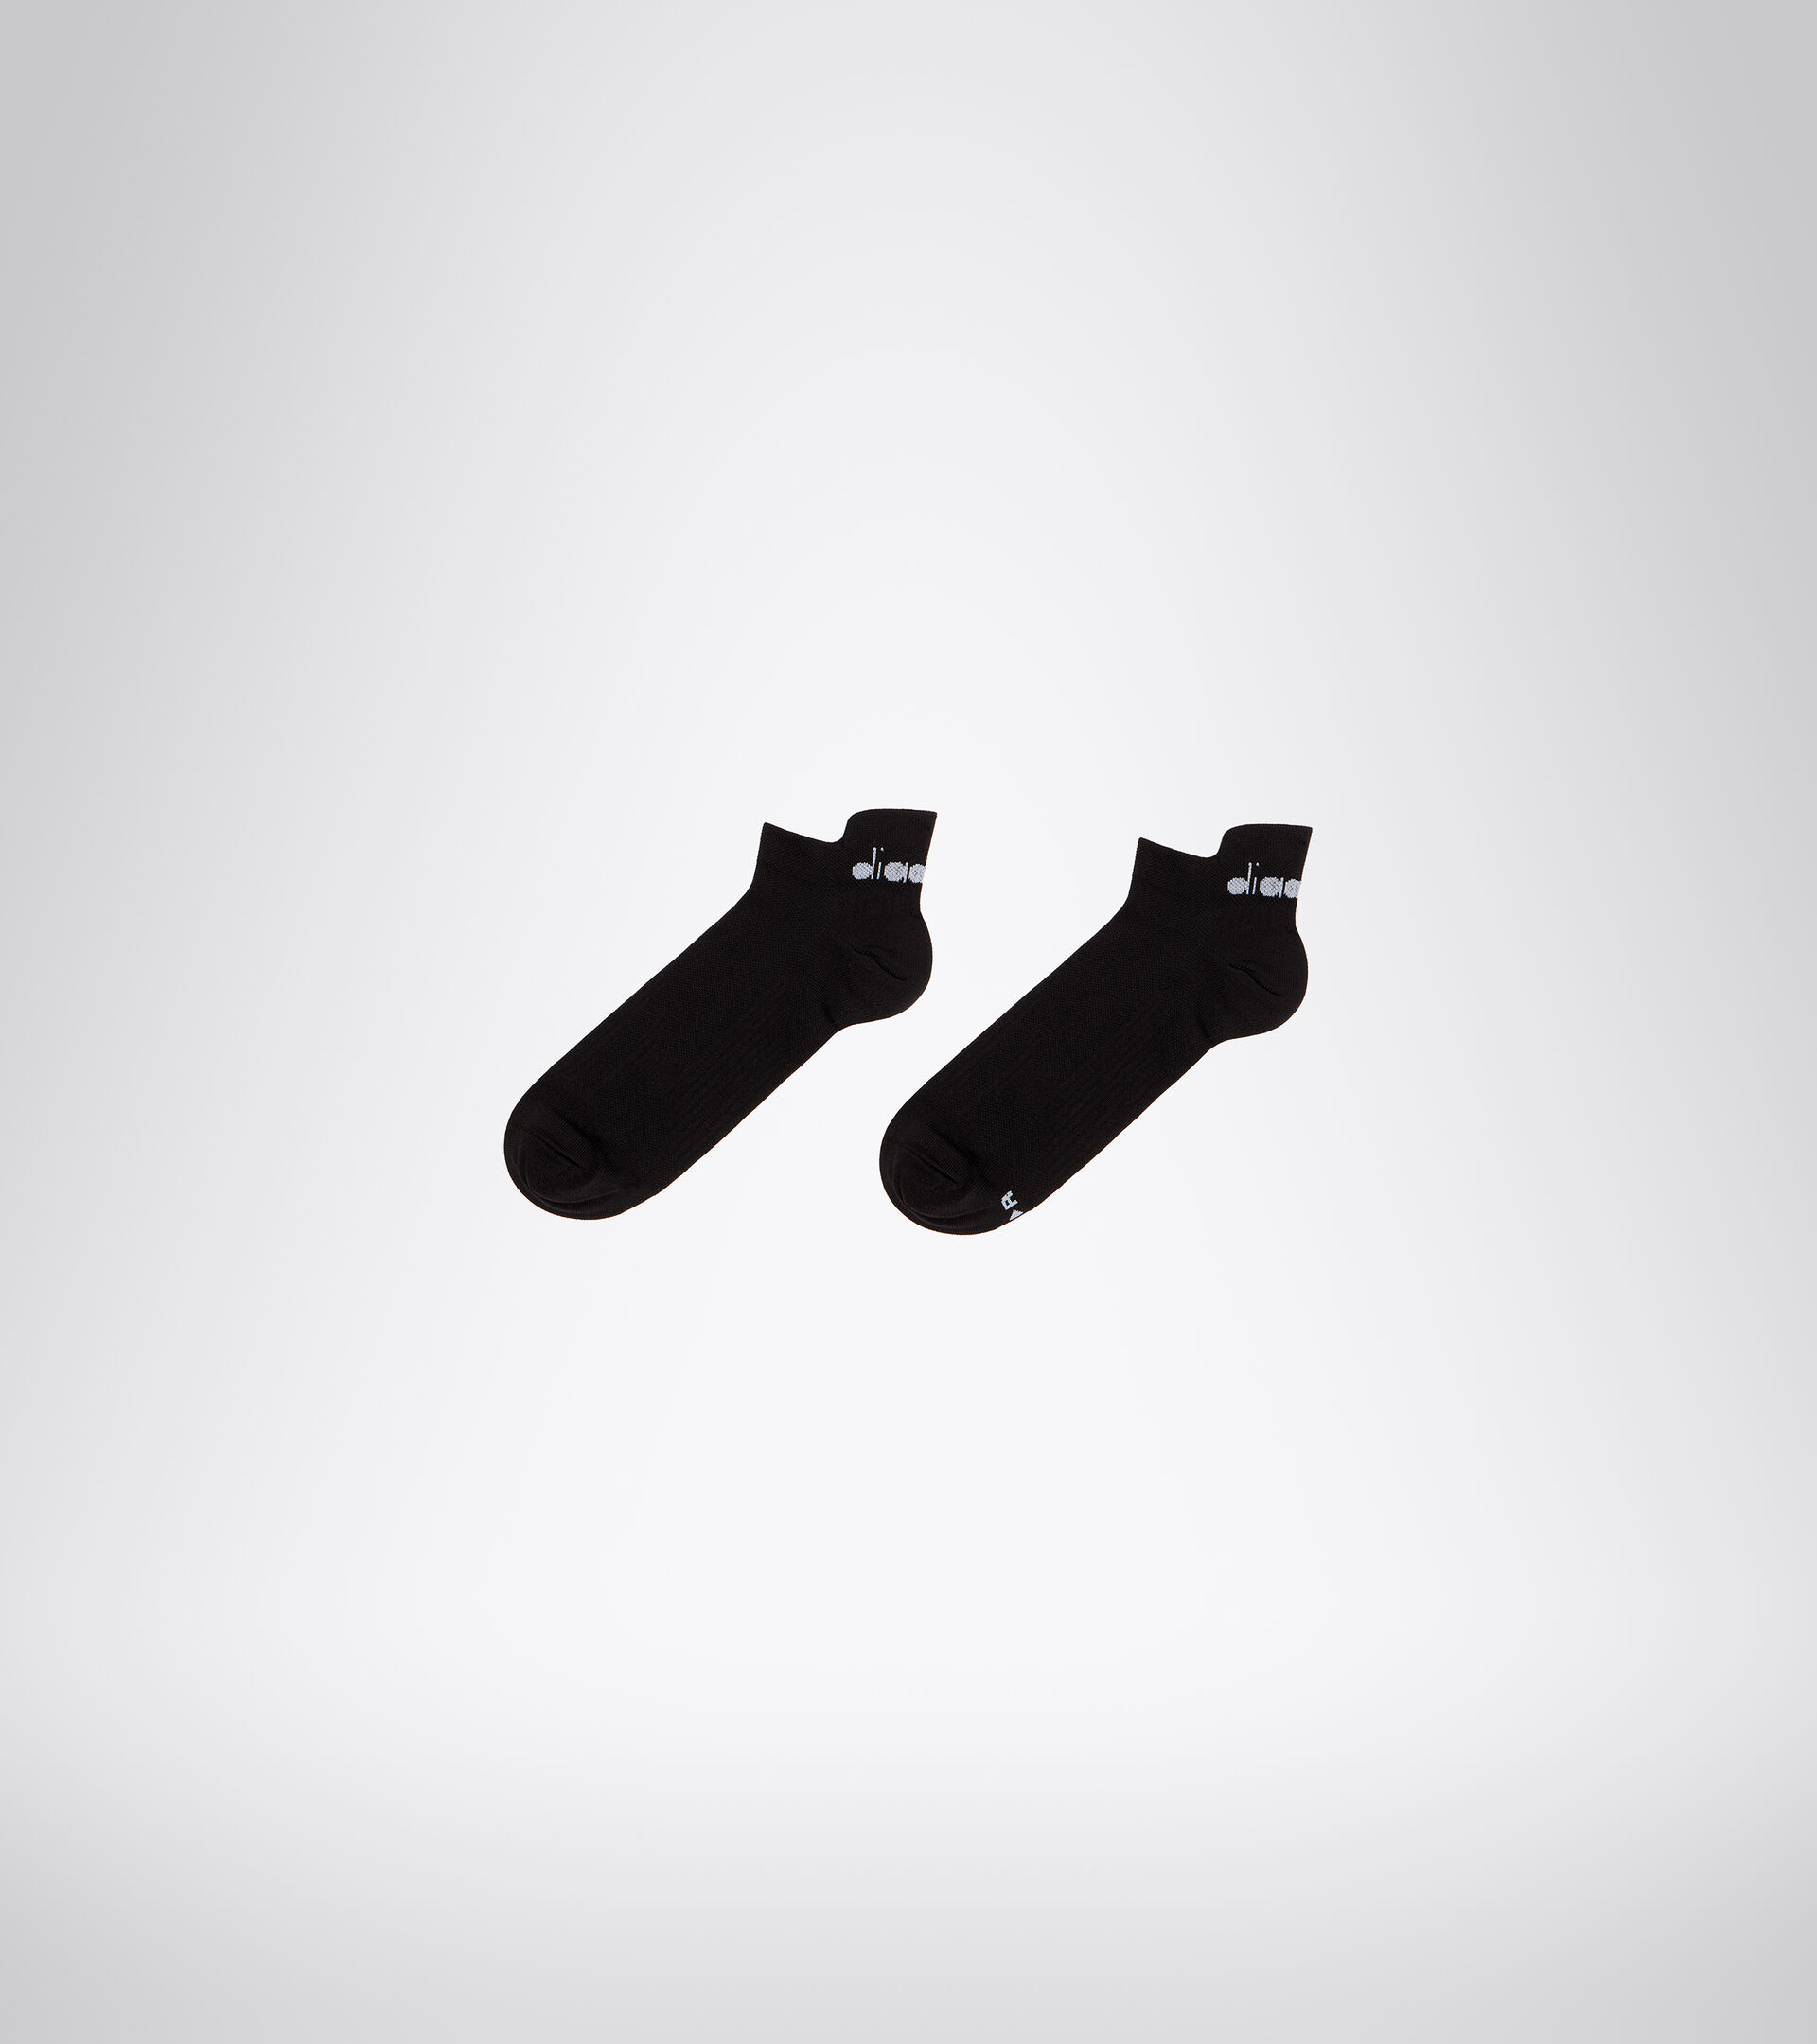 Calcetines de Running - Unisex LIGHTWEIGHT QUARTER SOCKS NEGRO - Diadora